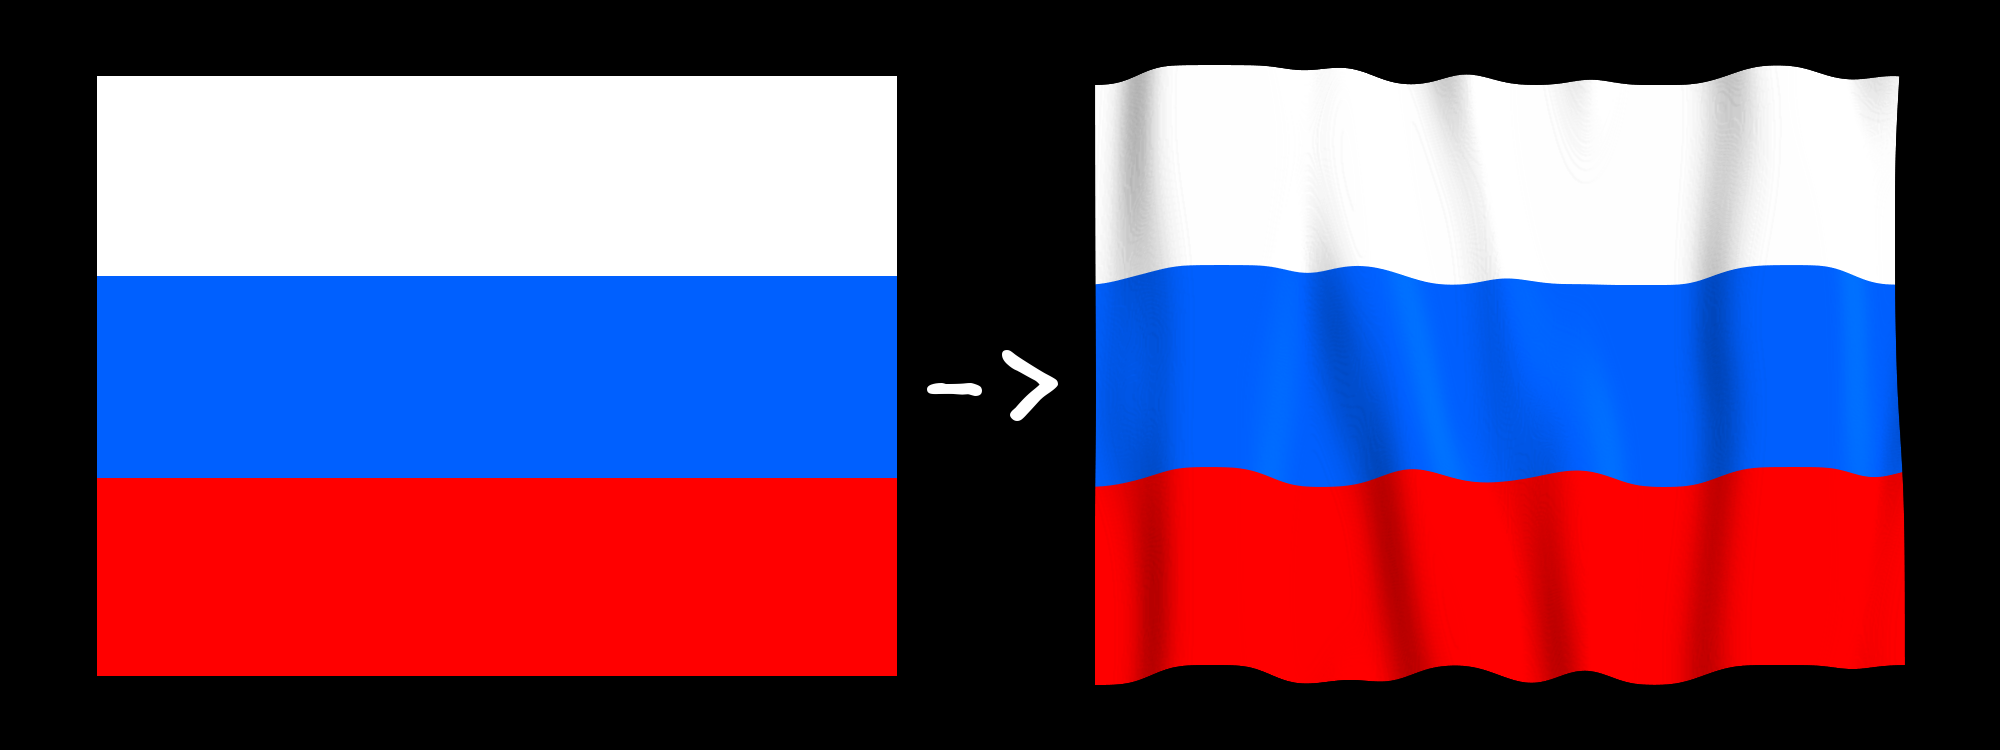 Waving flag script-fu